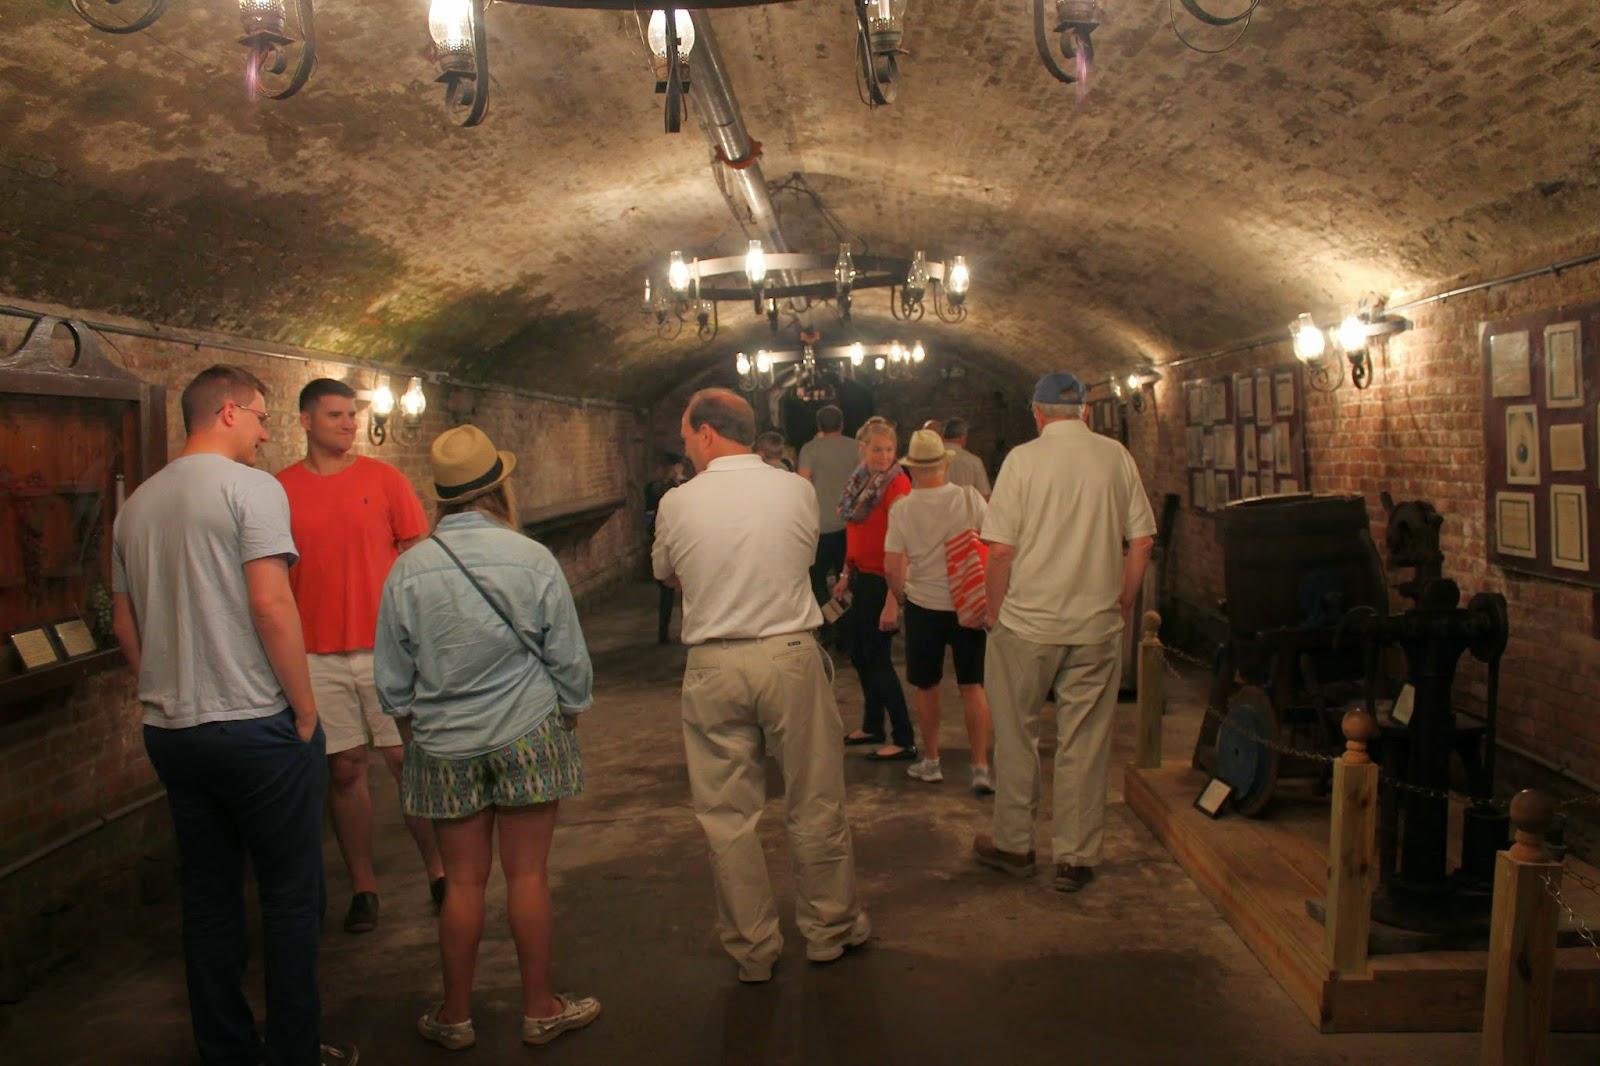 Brotherhood Winery cellar